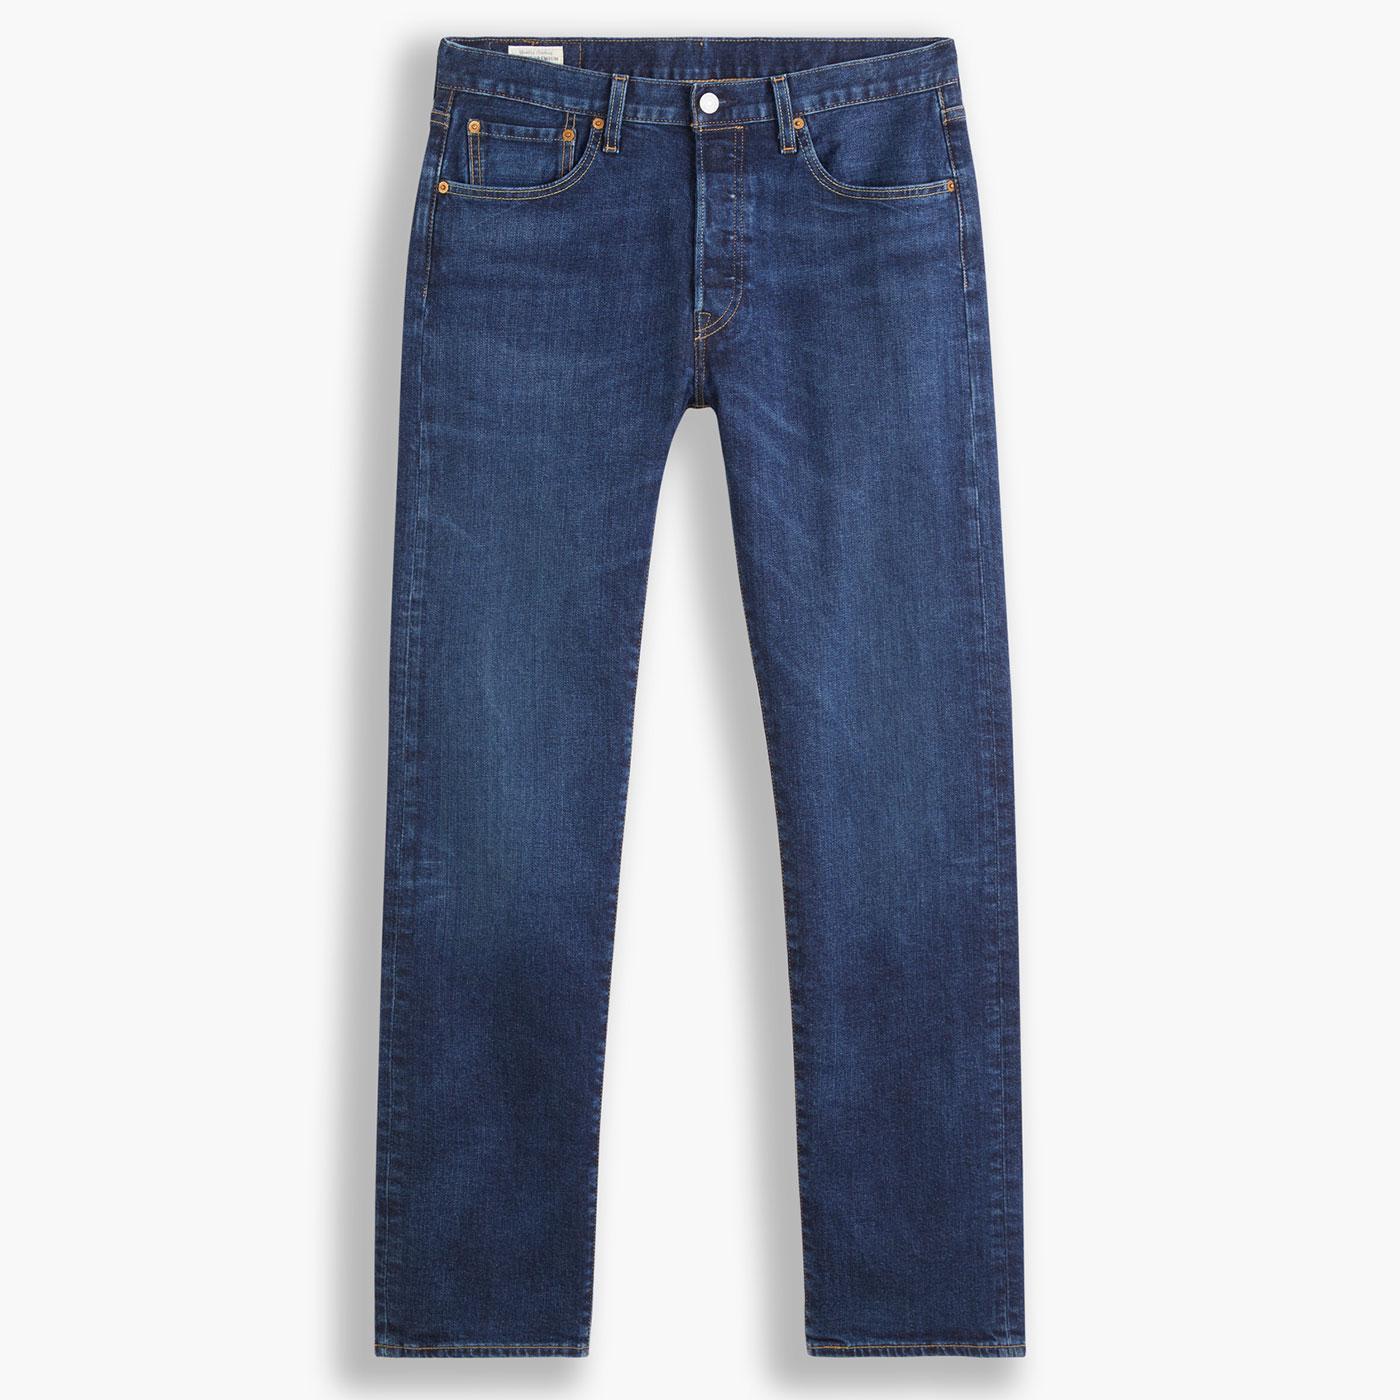 LEVI'S 501 Original Straight Retro Jeans (DTR)